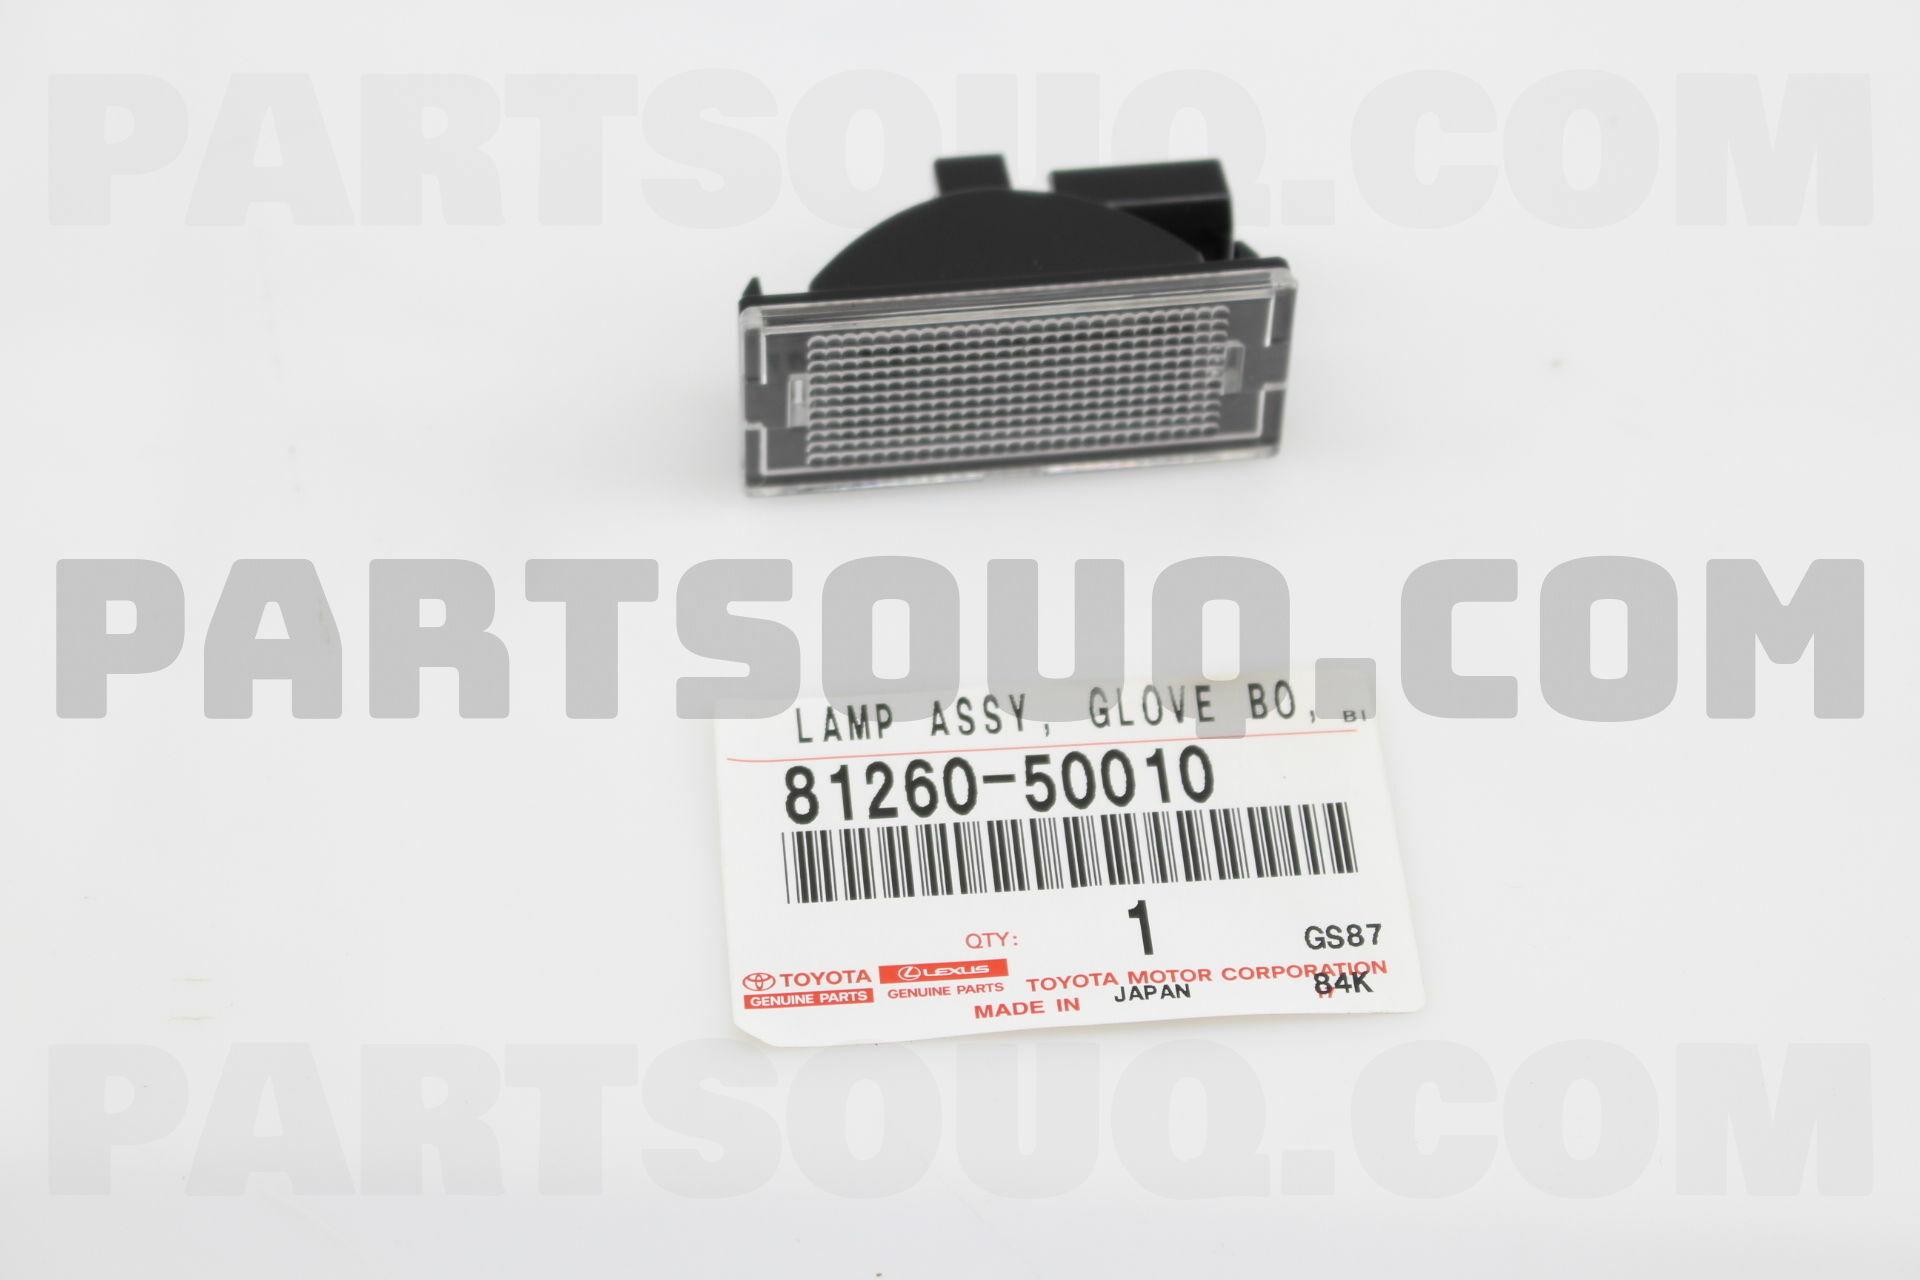 GLOVE BOX Toyota Part 81260-50010 LAMP ASSY